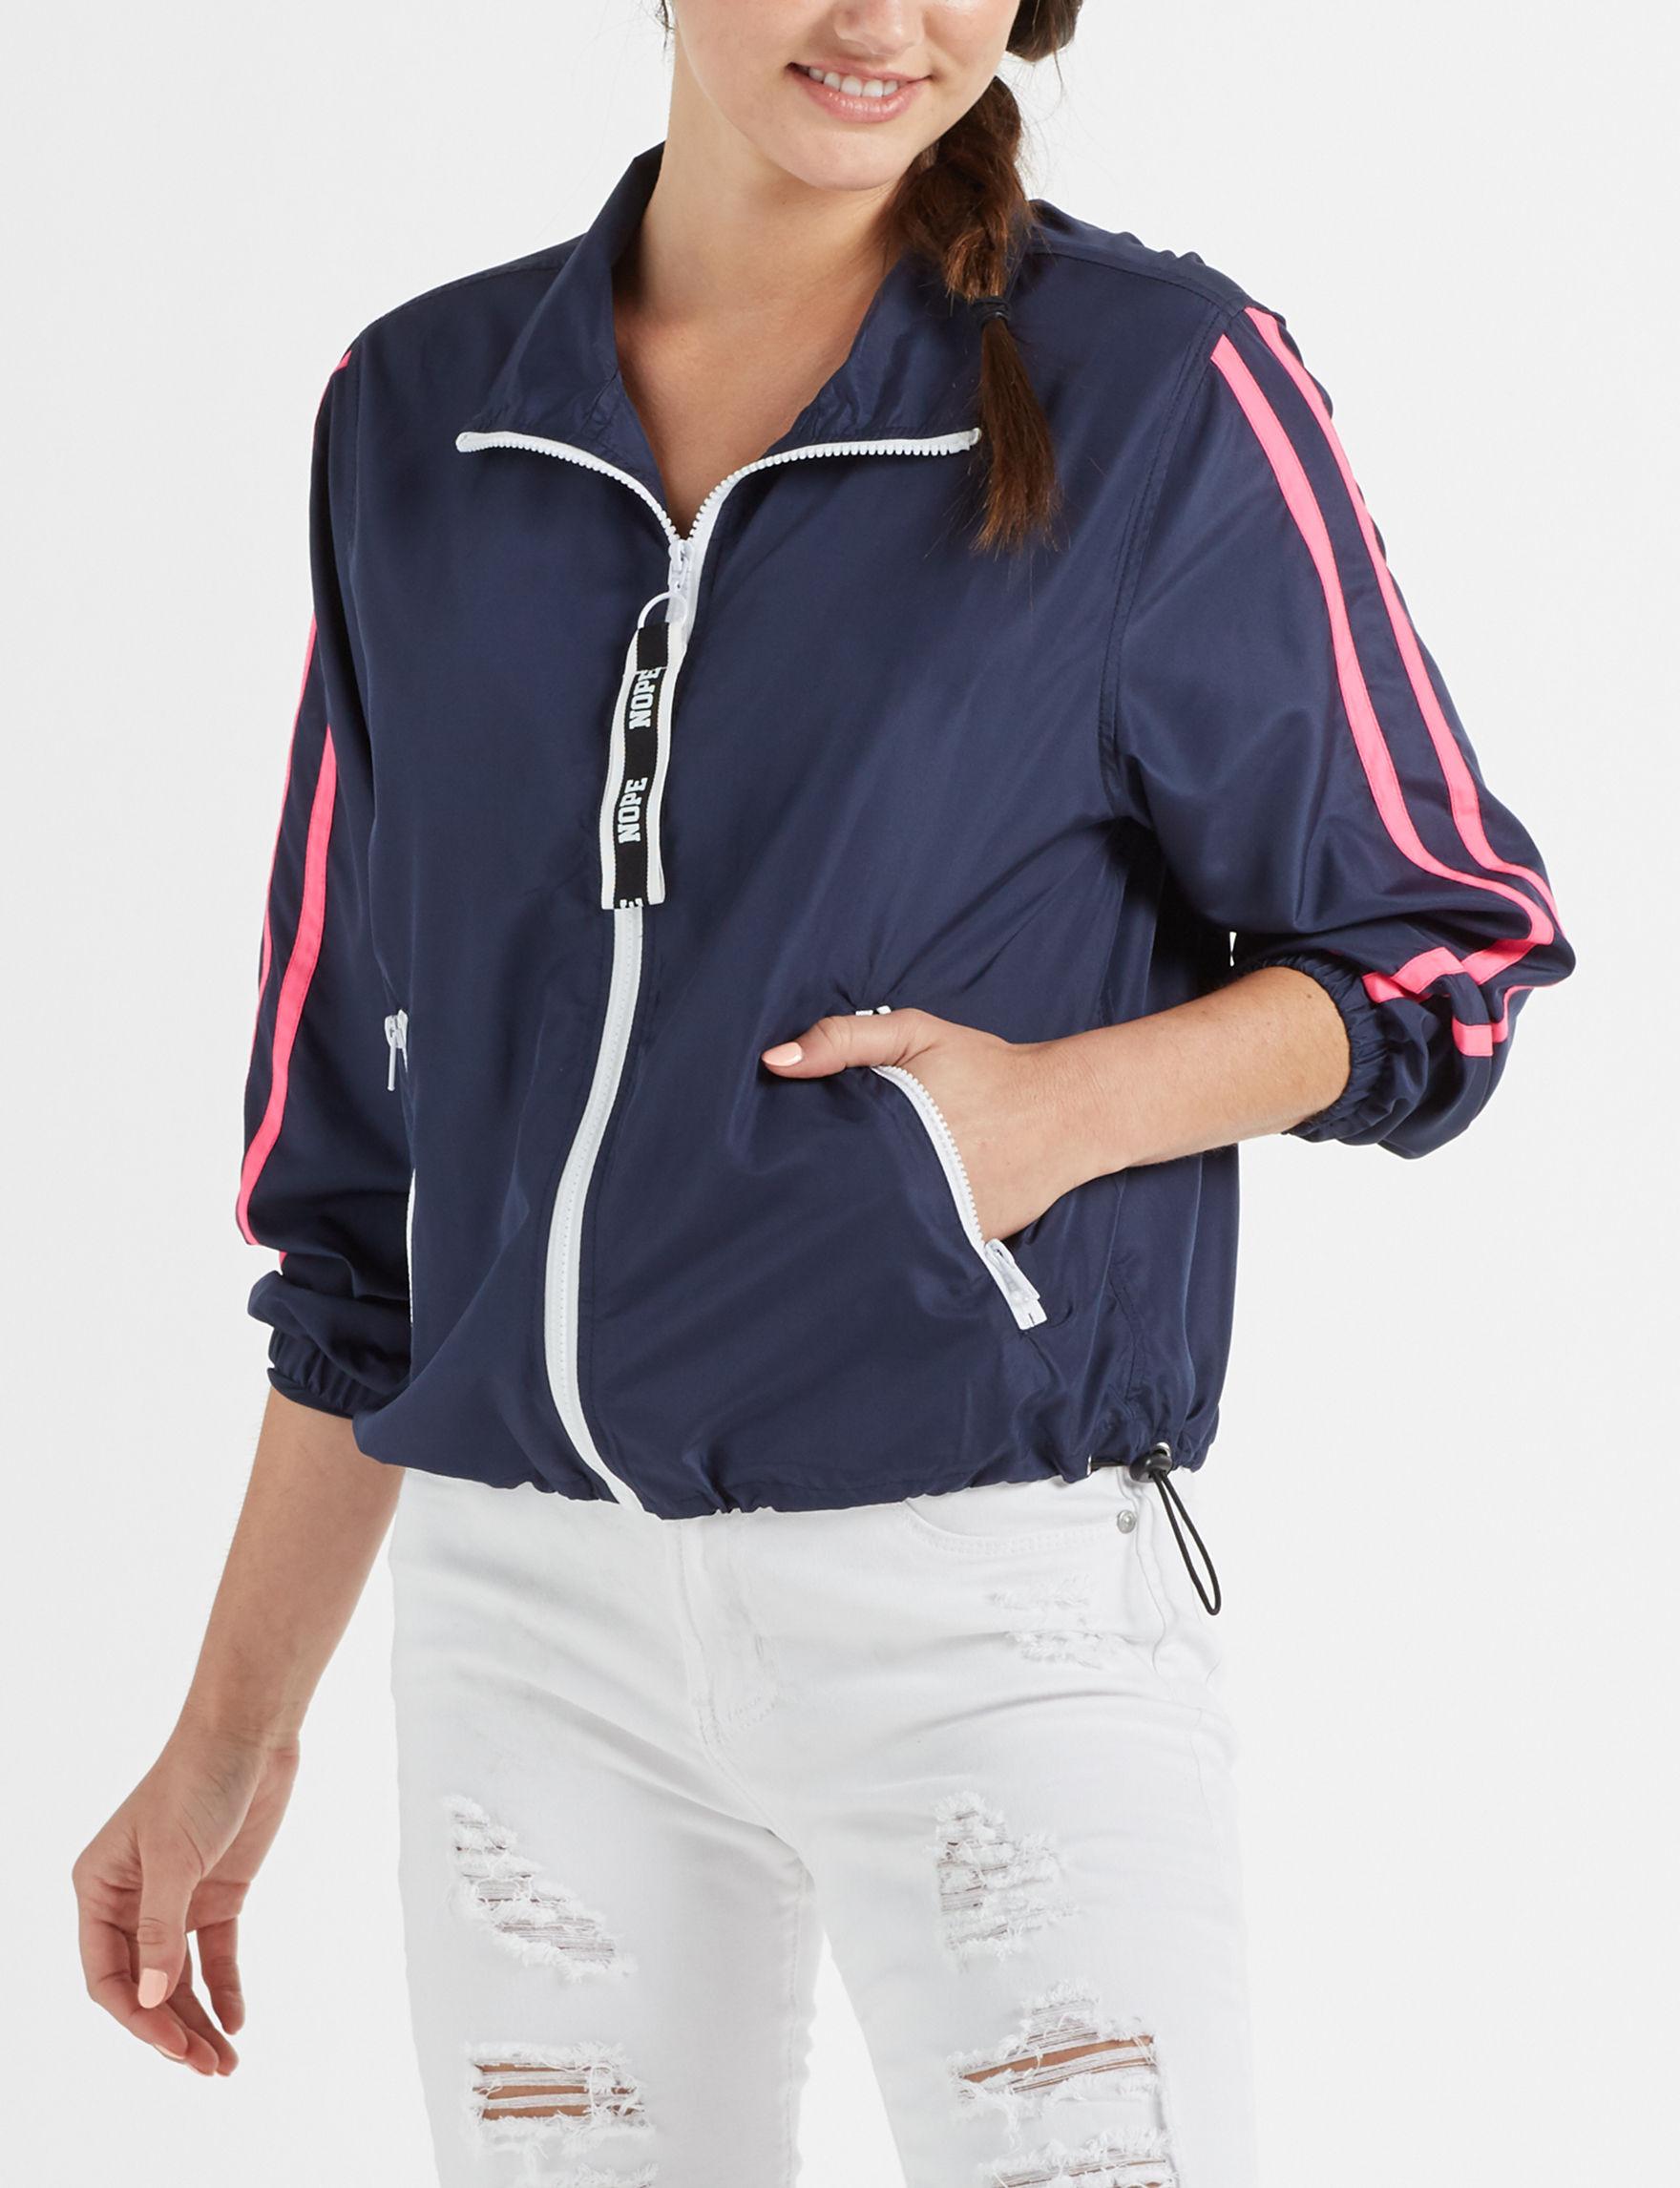 Justify Navy Lightweight Jackets & Blazers